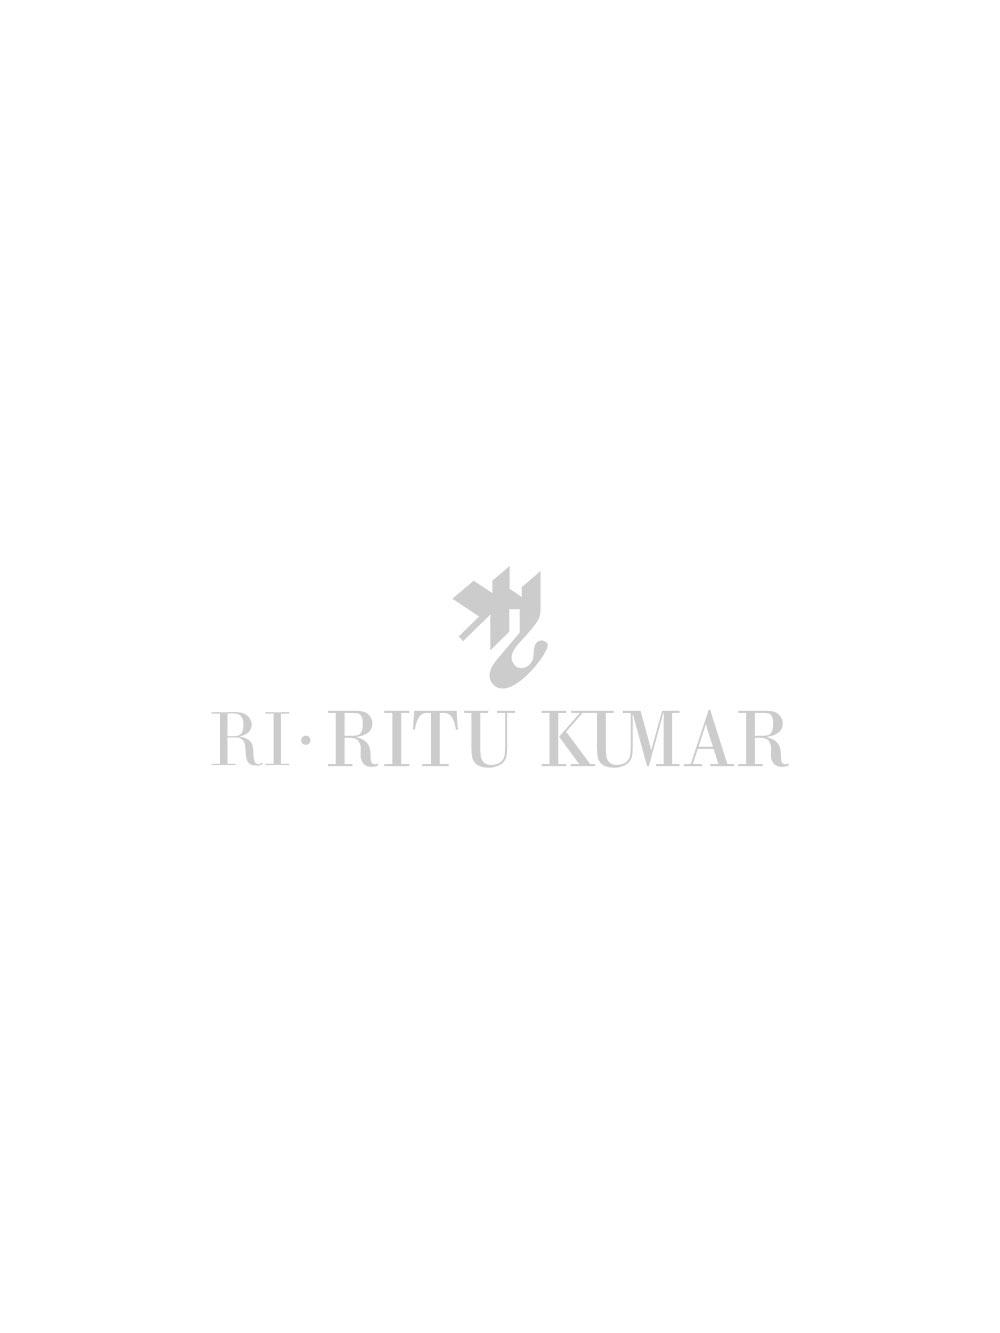 Black & Khaki Embroidered Kurta With Dupatta And Palazzo